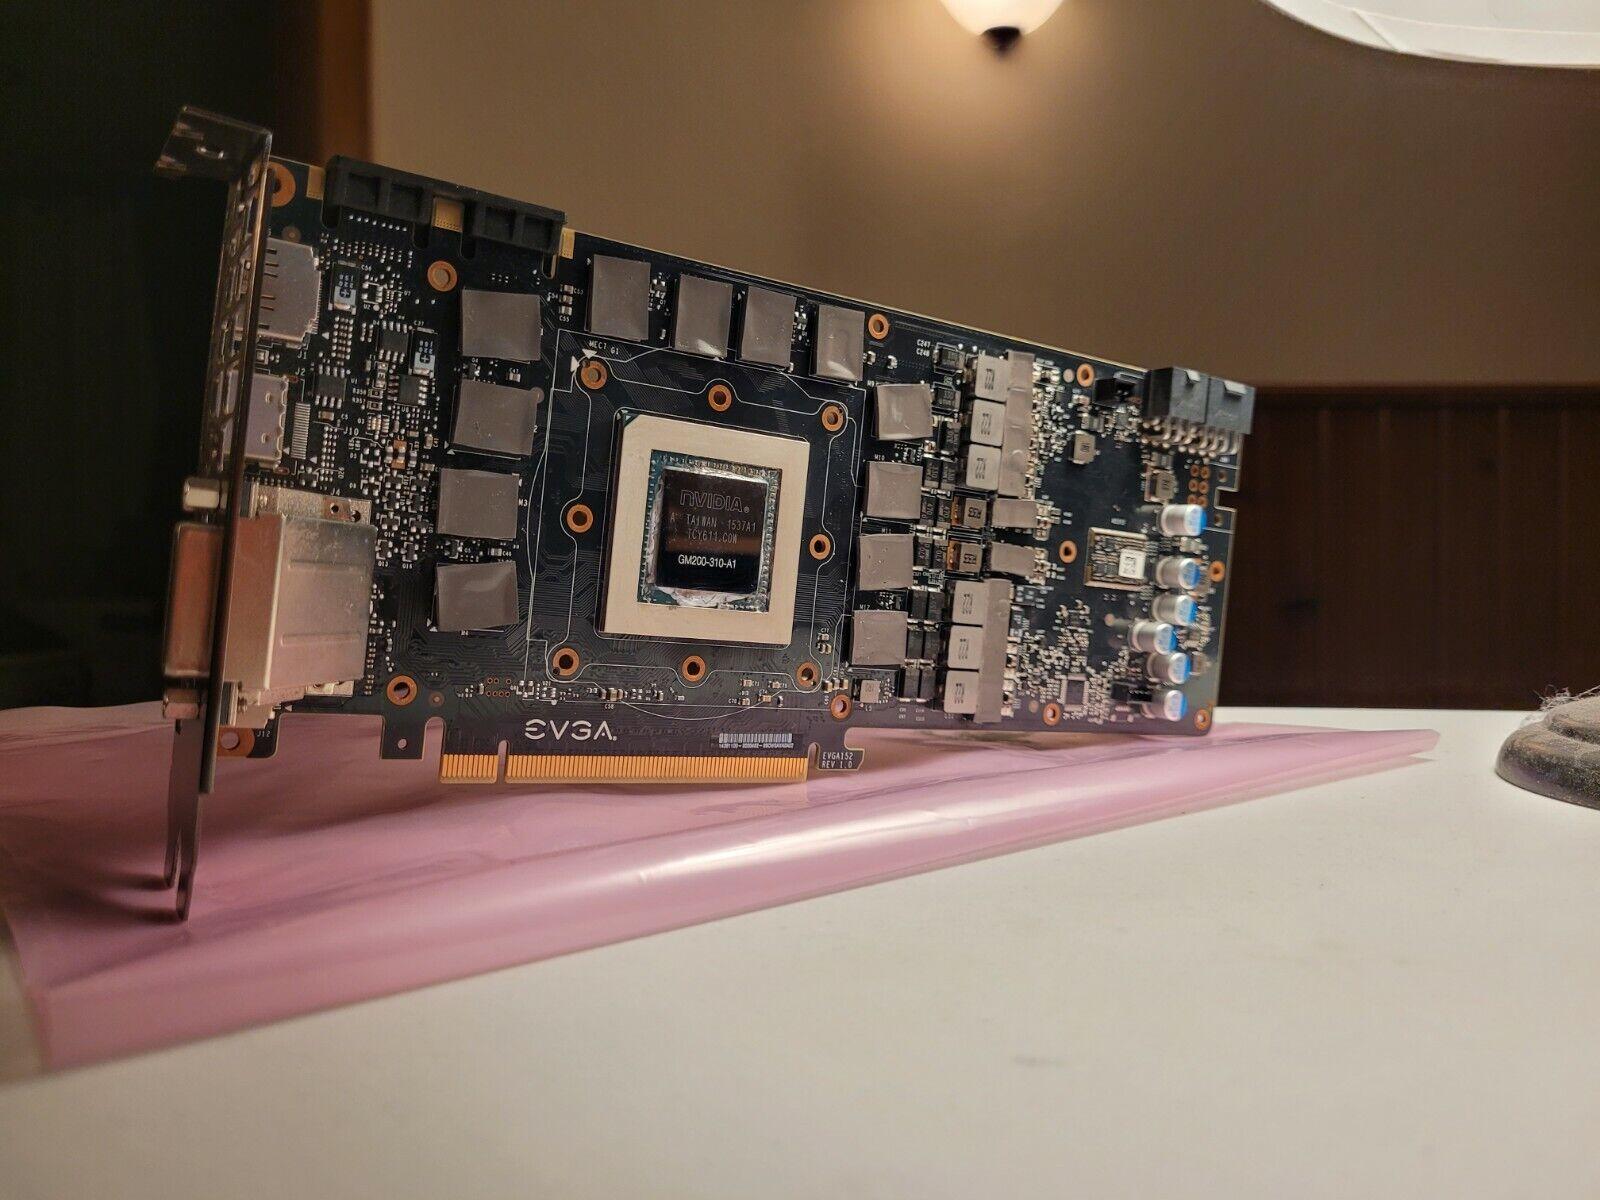 Nvidia EVGA GeForce GTX 980 Ti 6GB Graphics Card